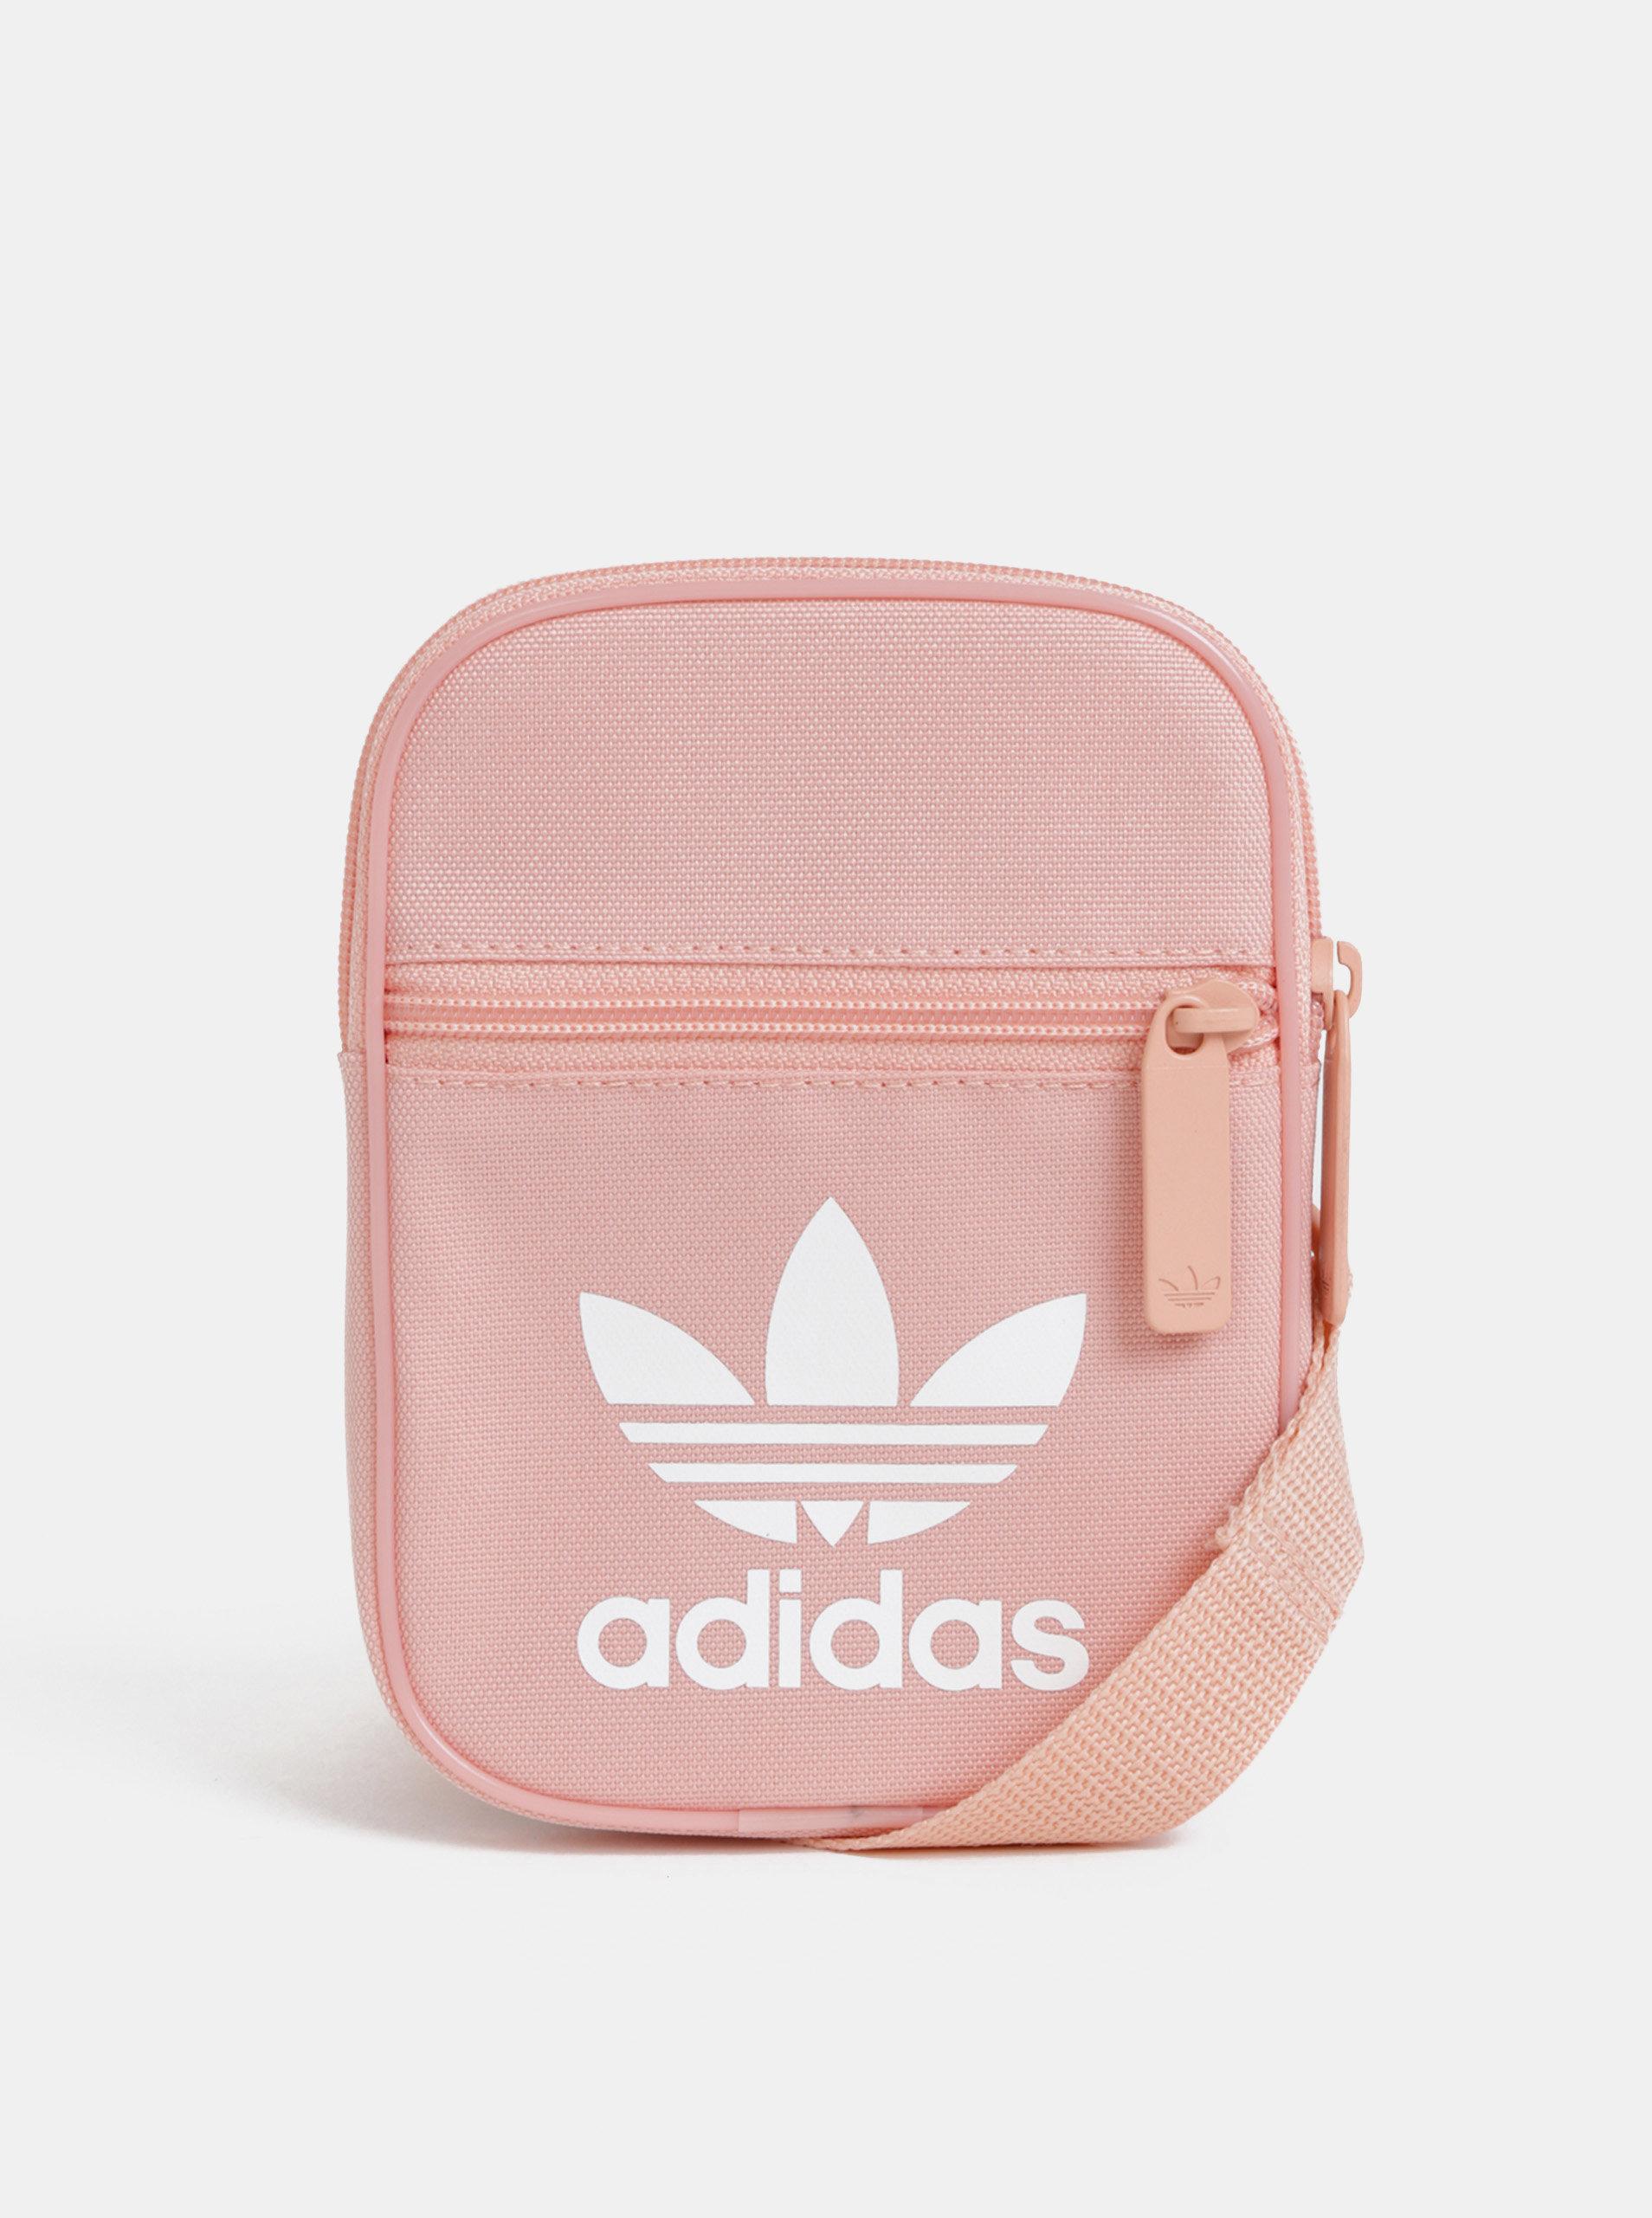 809a035a79 Růžová crossbody kabelka adidas Originals ...